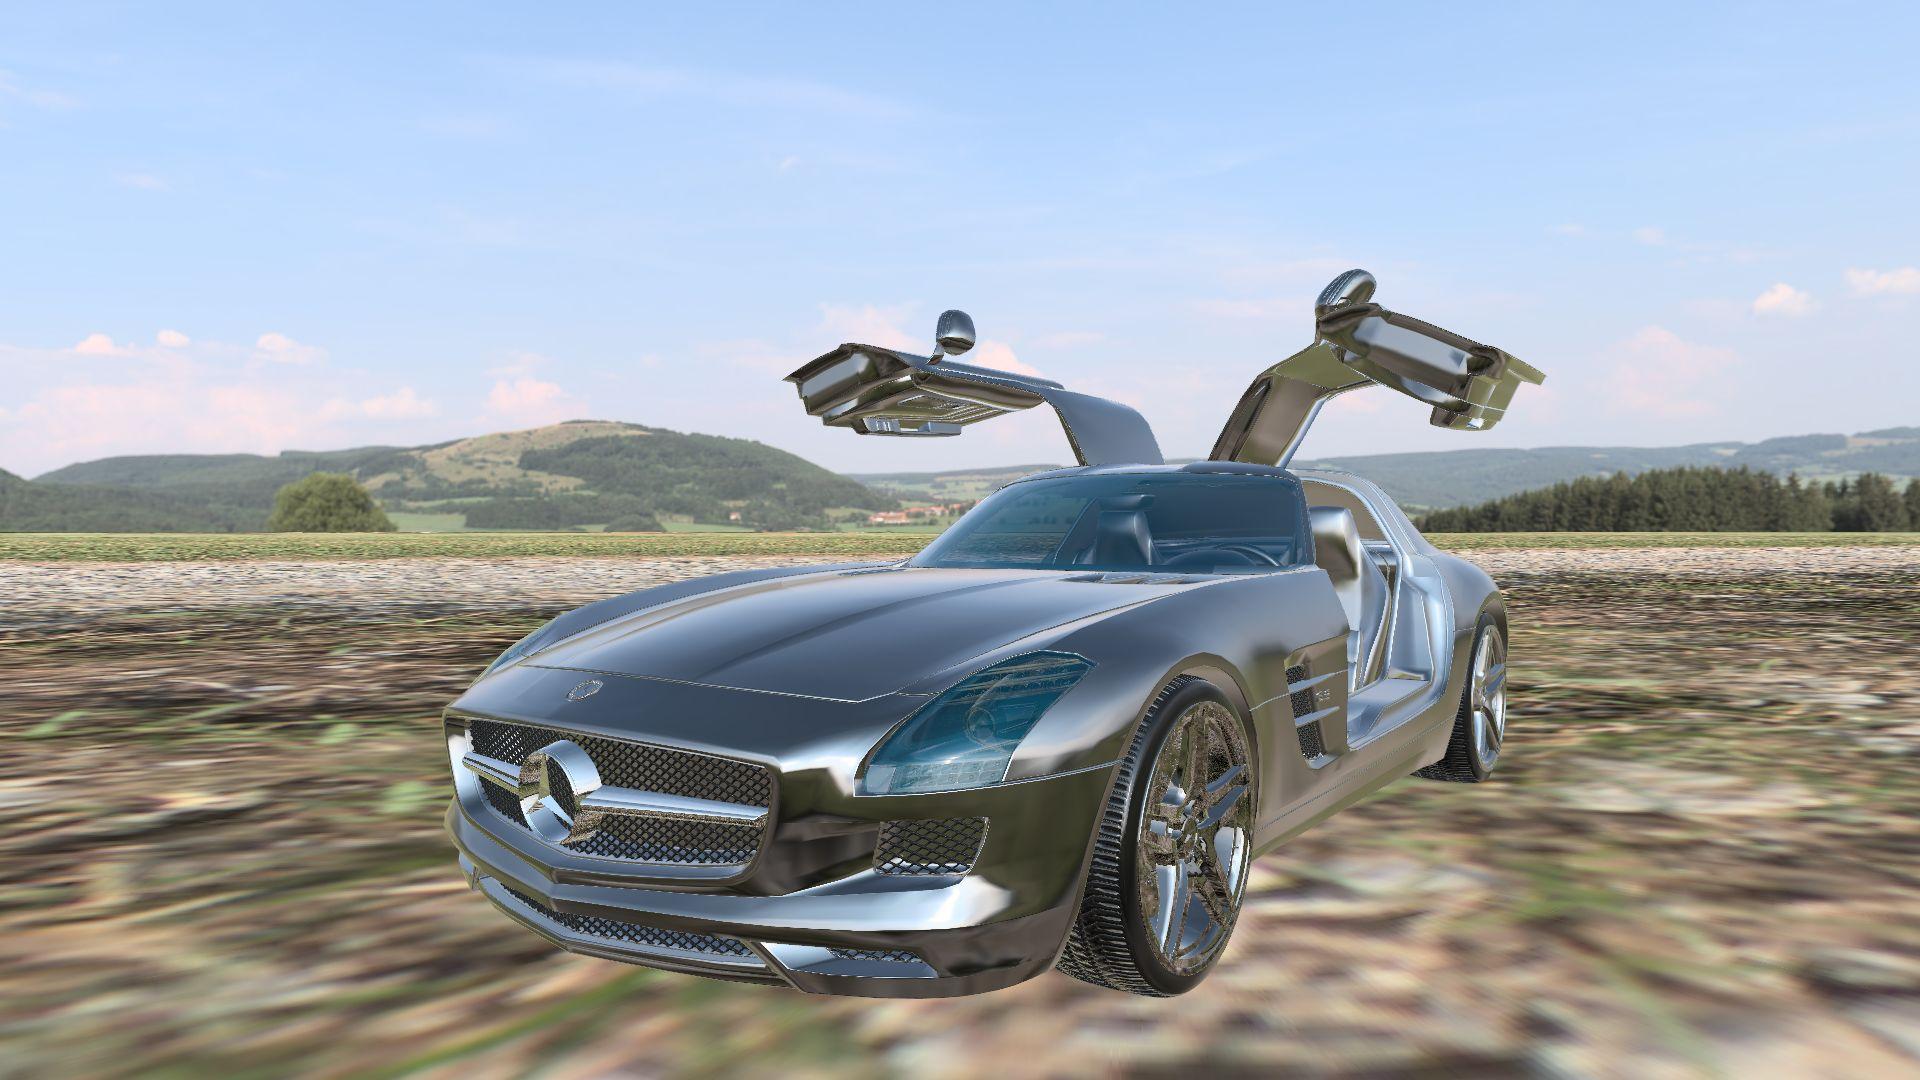 Benz-01-3500-3500